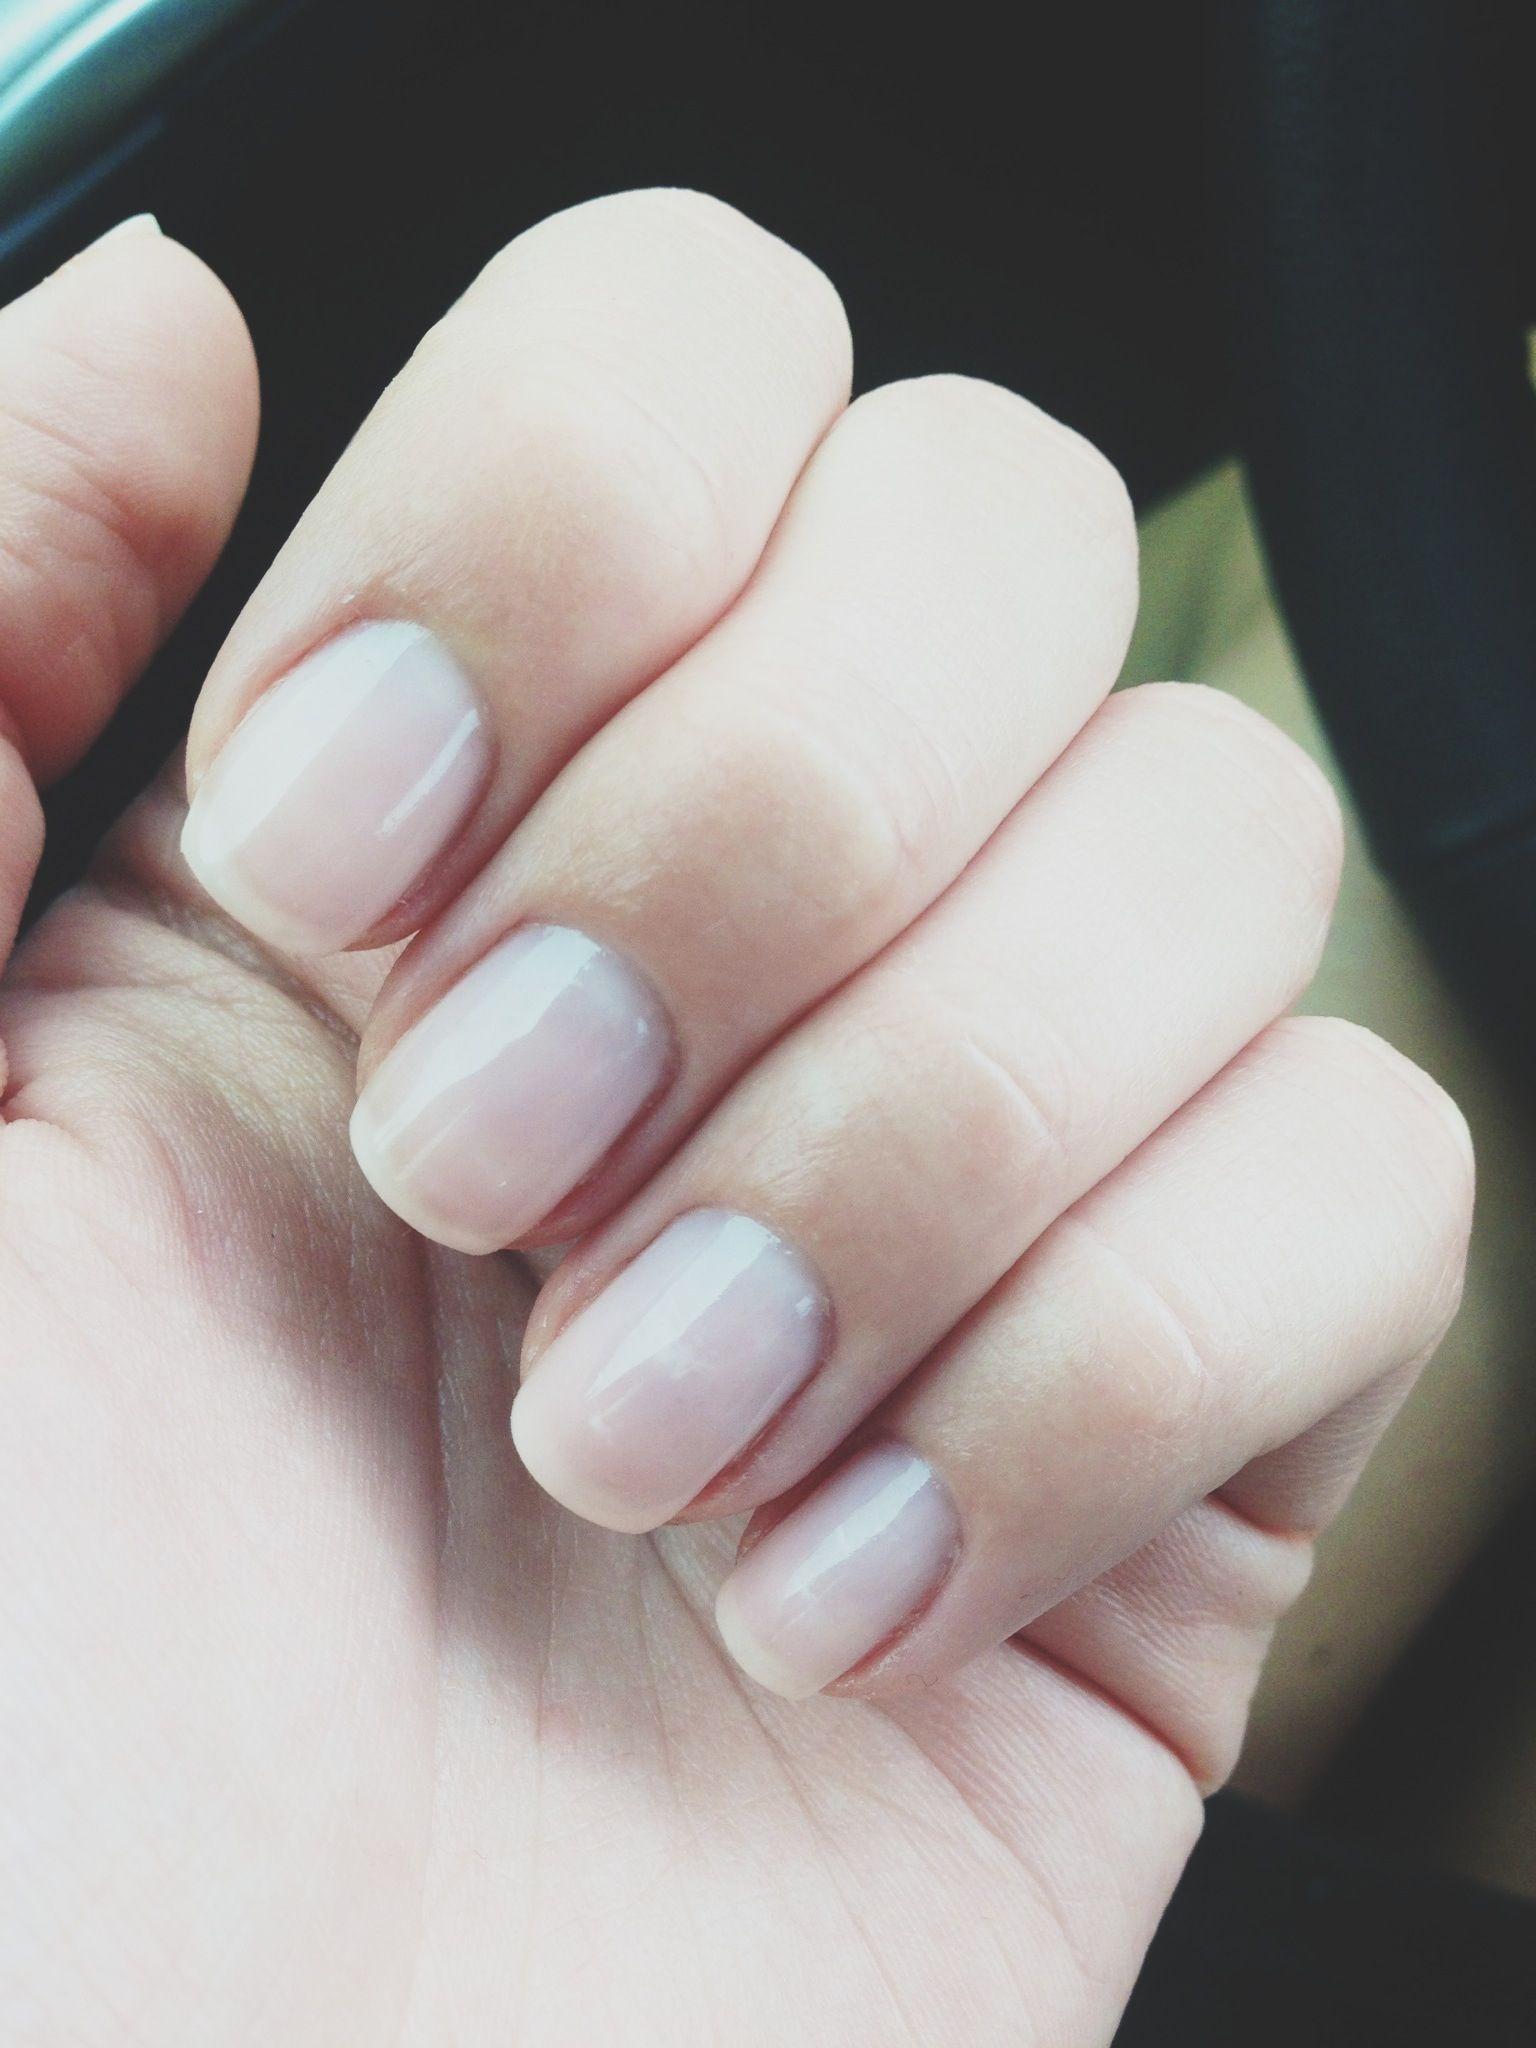 Perfect natural nail- OPI shellac bubble bath | Beauty. | Pinterest ...